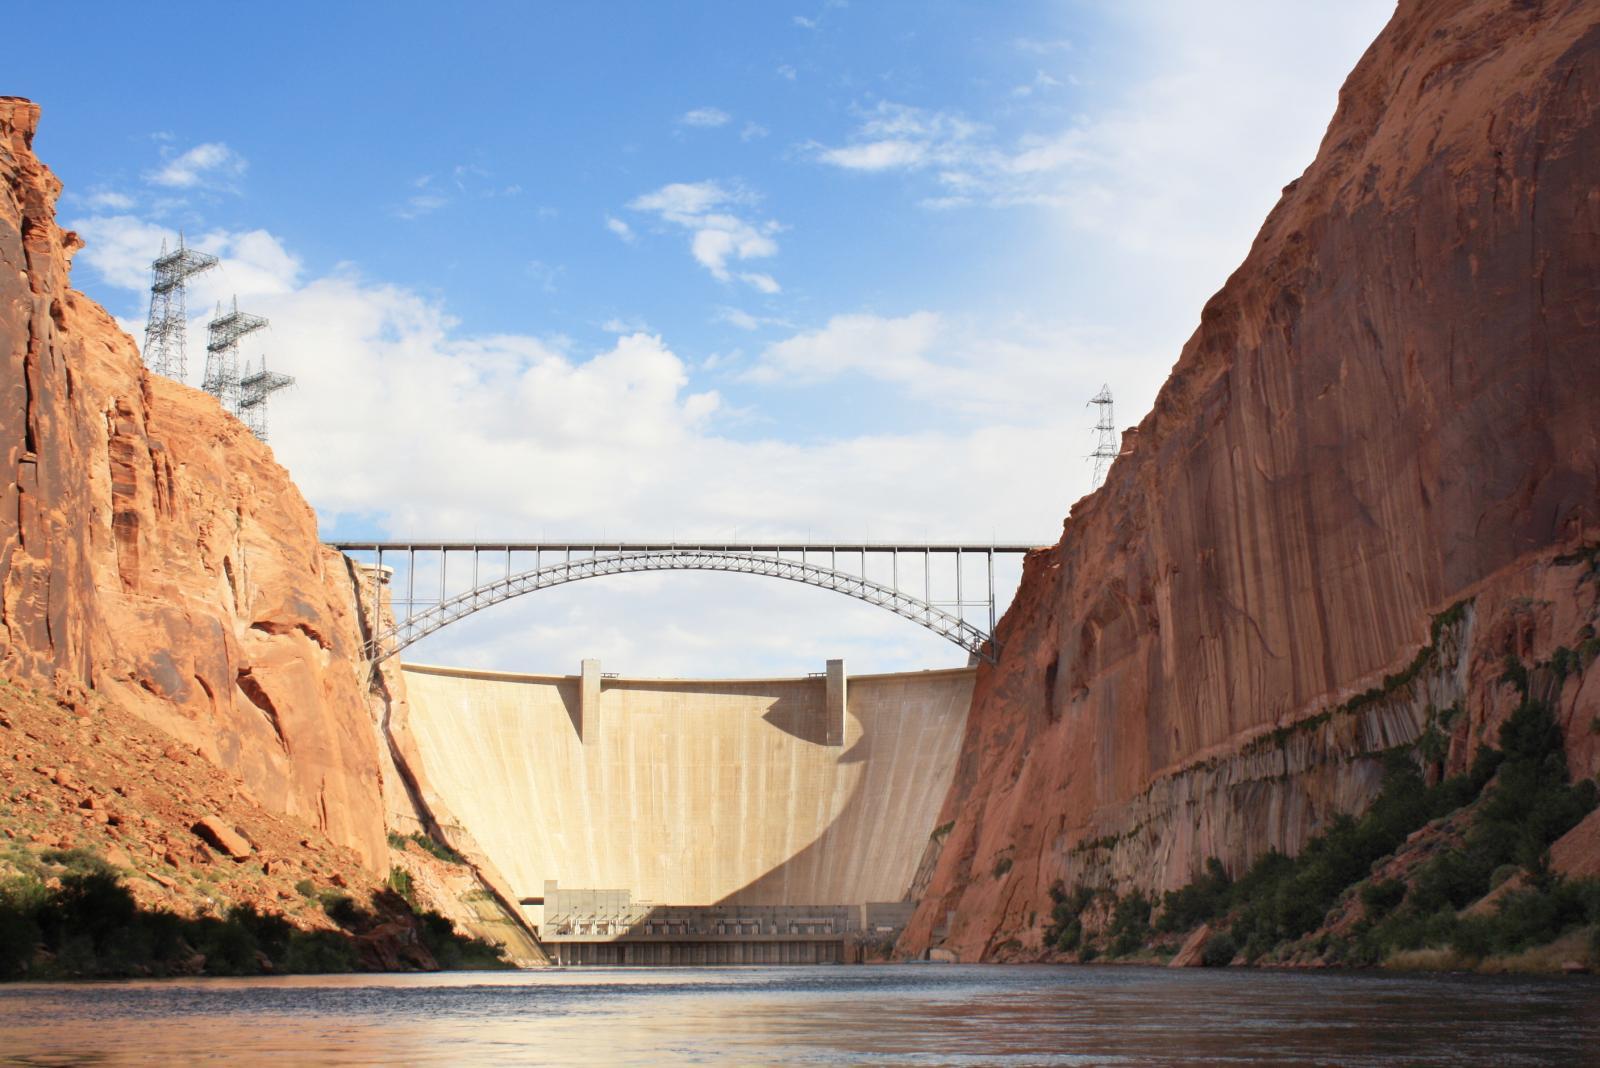 Arch Bridge By Hoover Dam